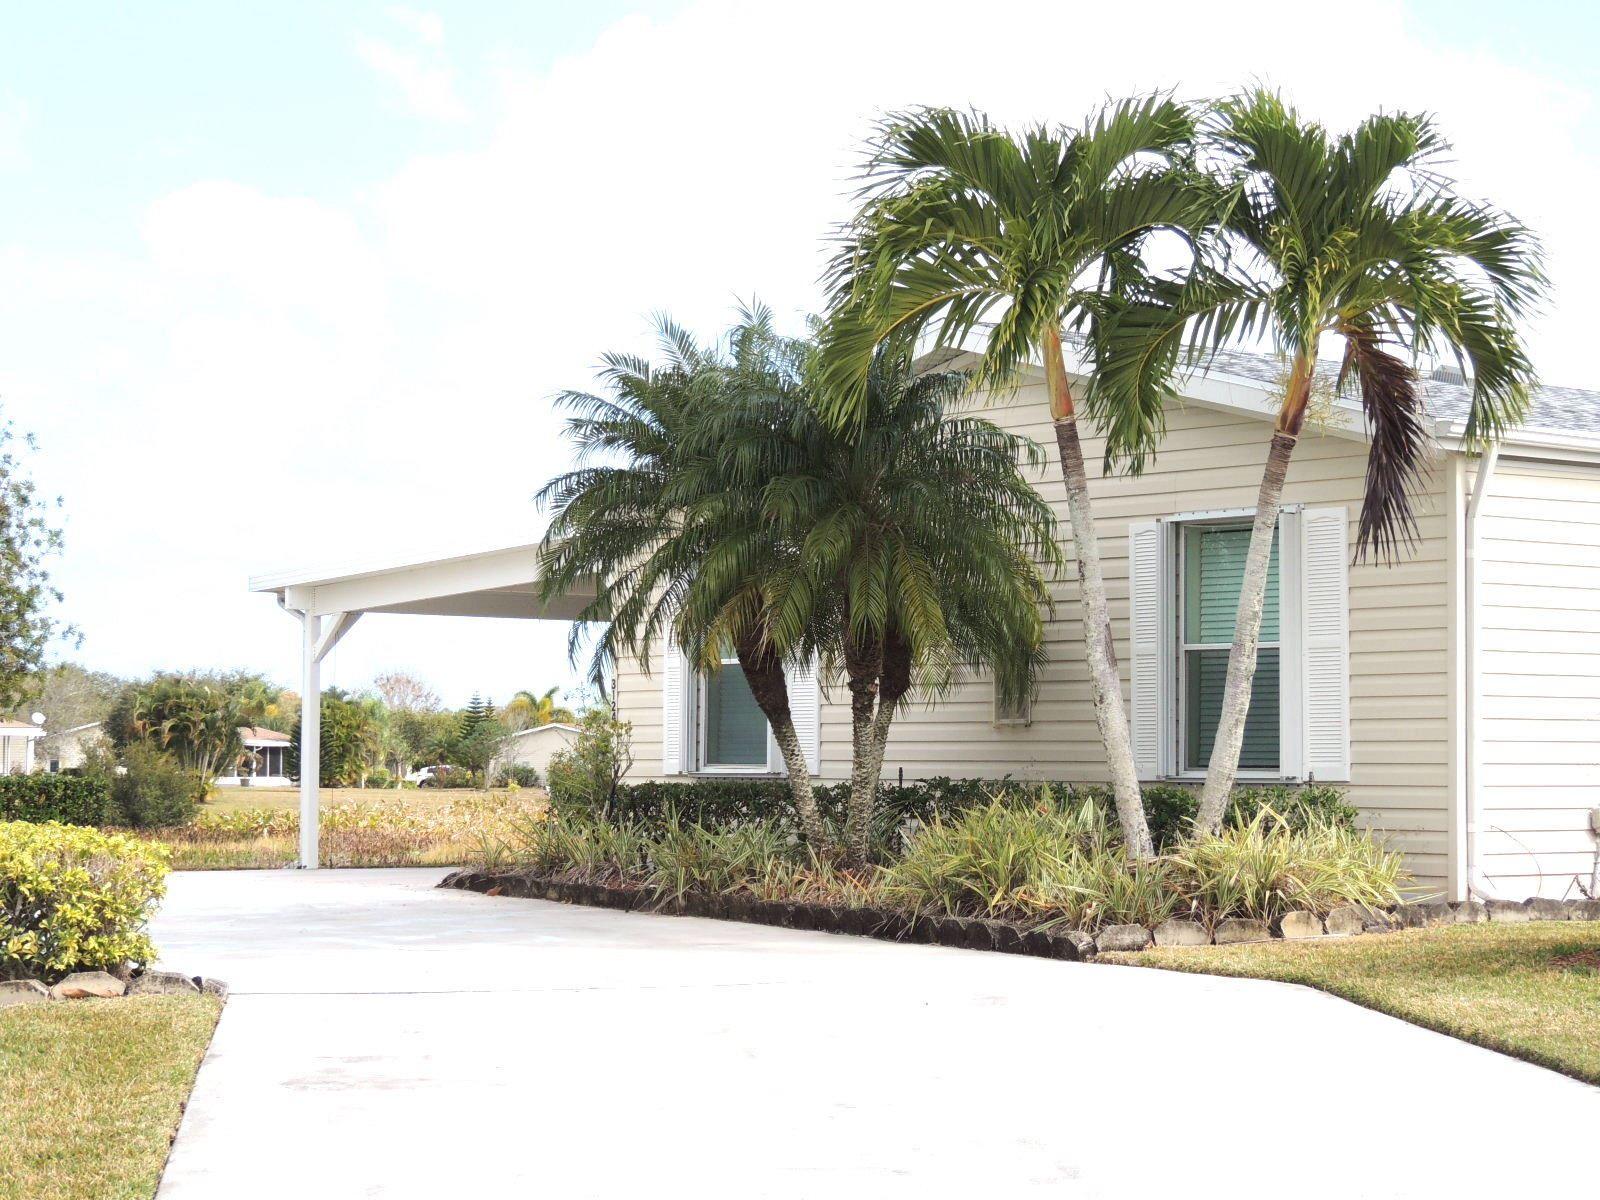 Photo of 3124 Palm Warbler Court, Port Saint Lucie, FL 34952 (MLS # RX-10687609)